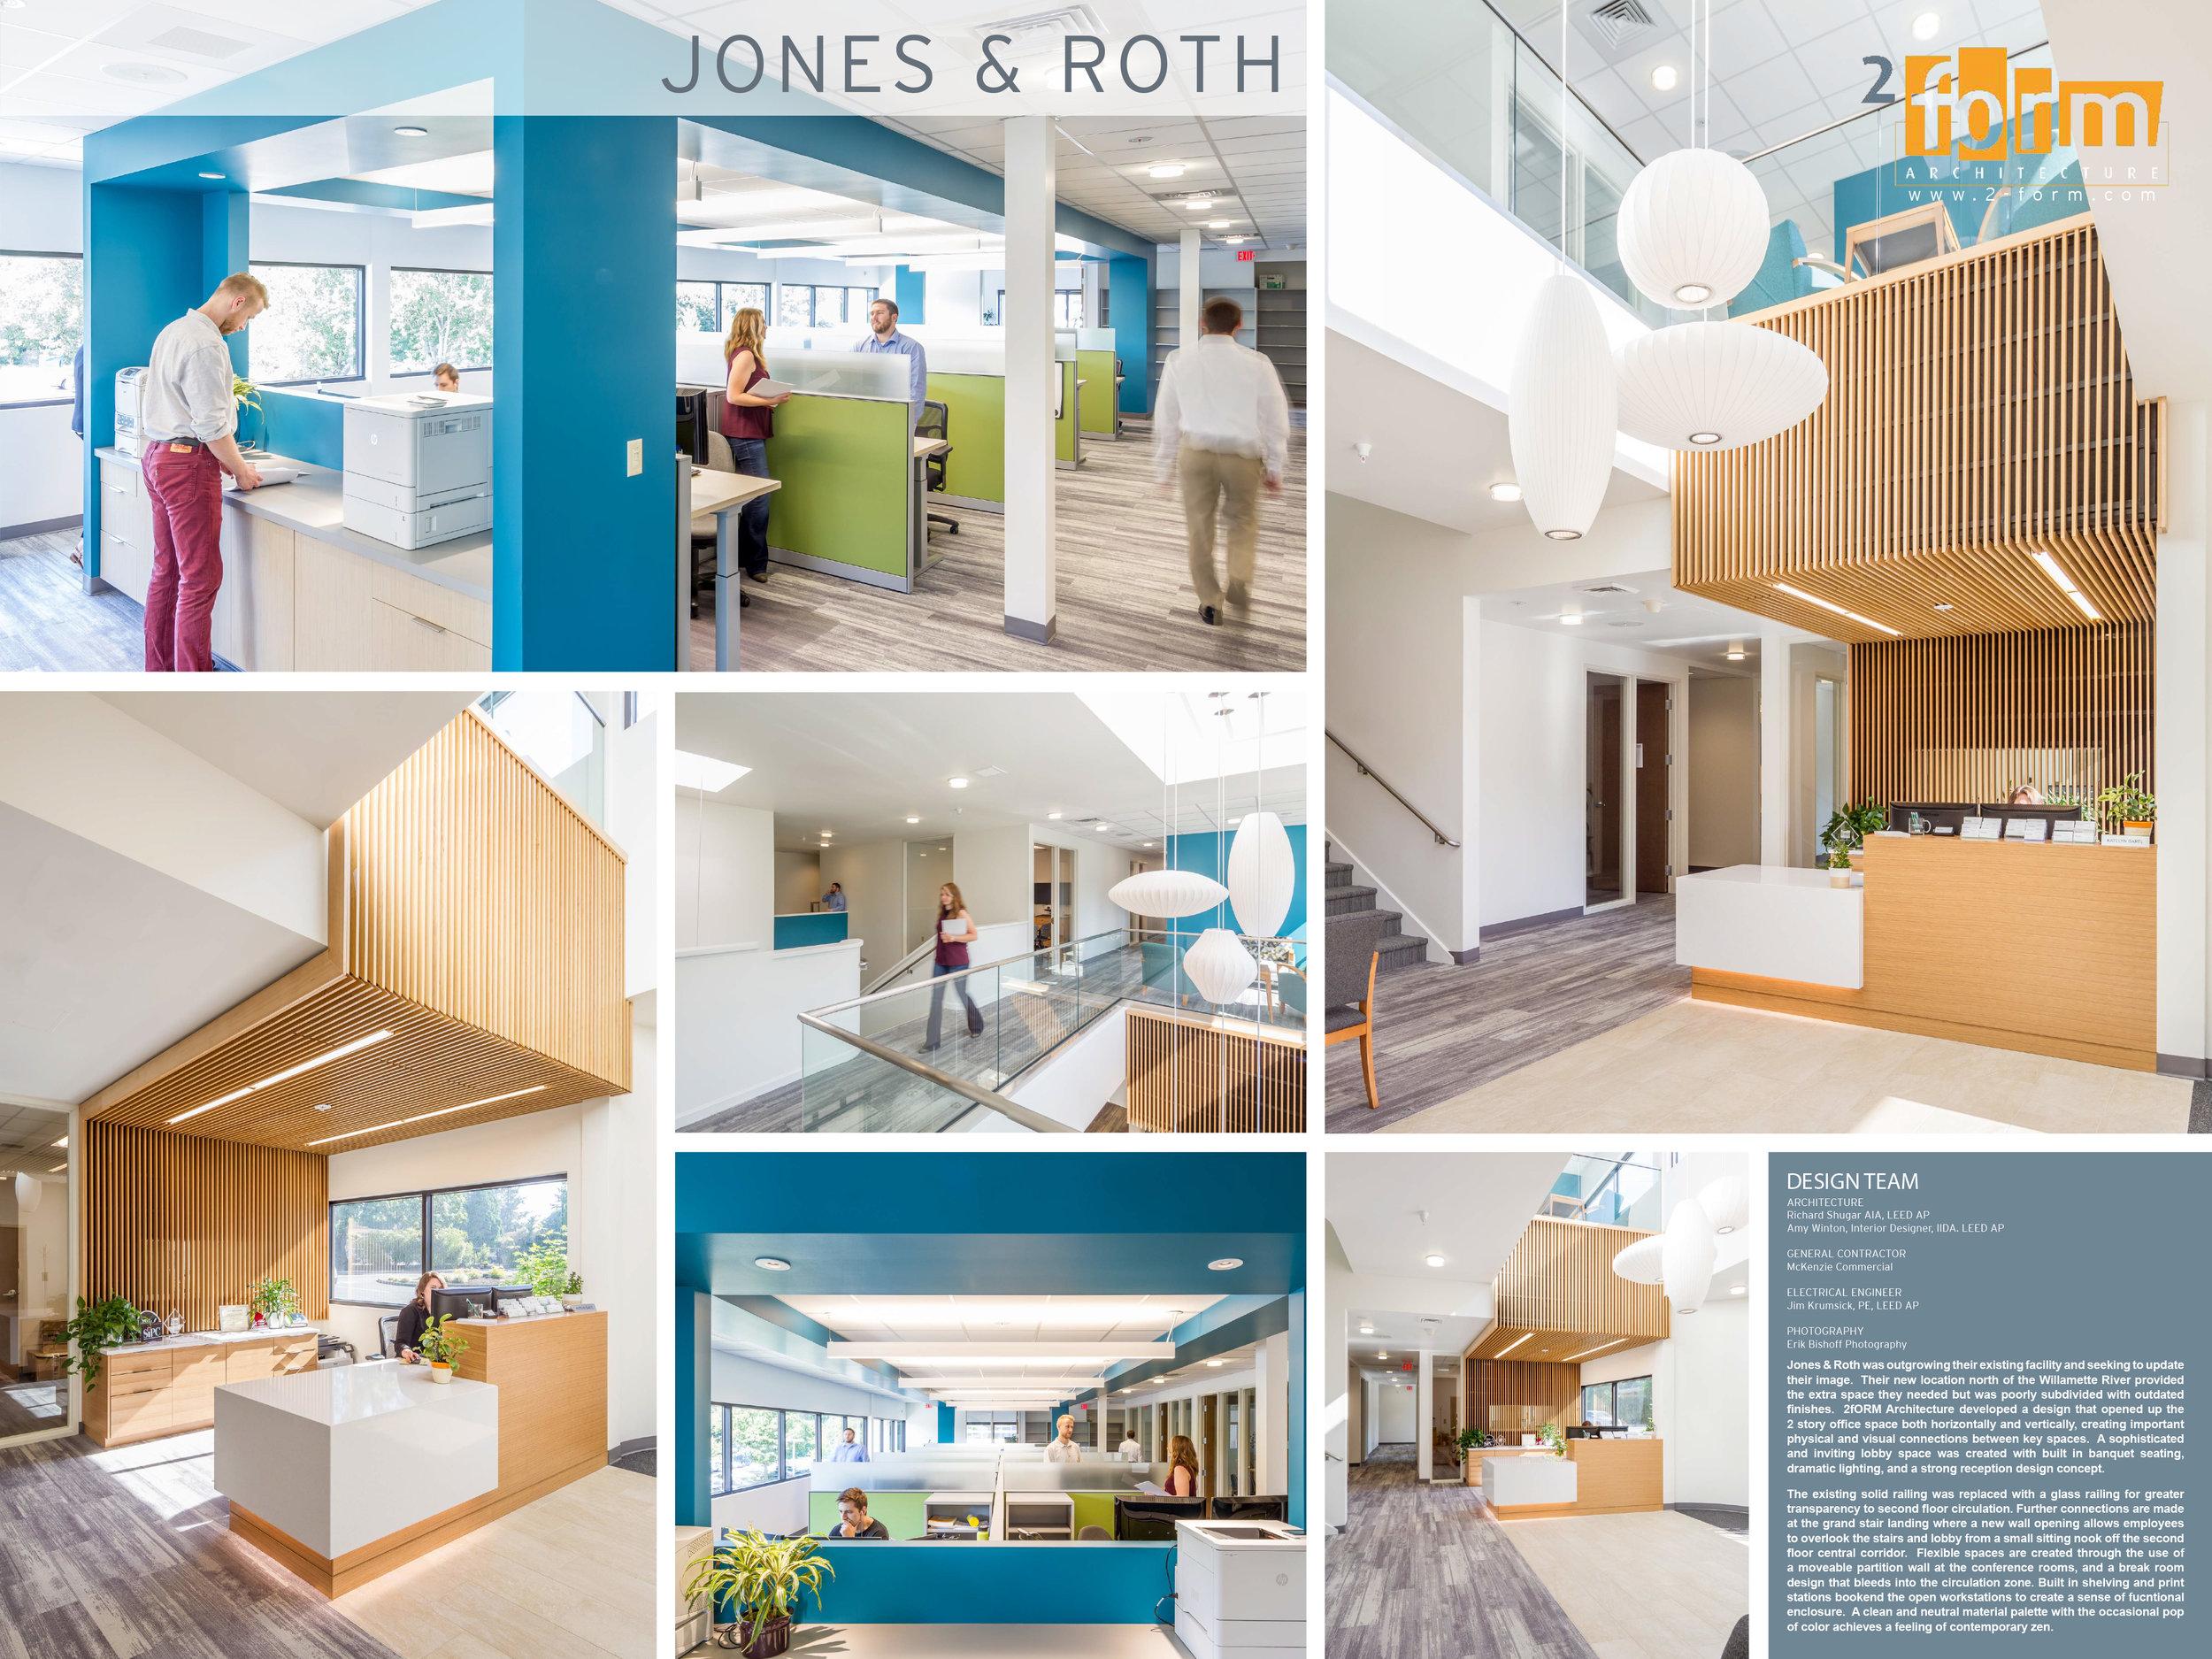 43_jones___roth_30x40_board_lowres.jpg